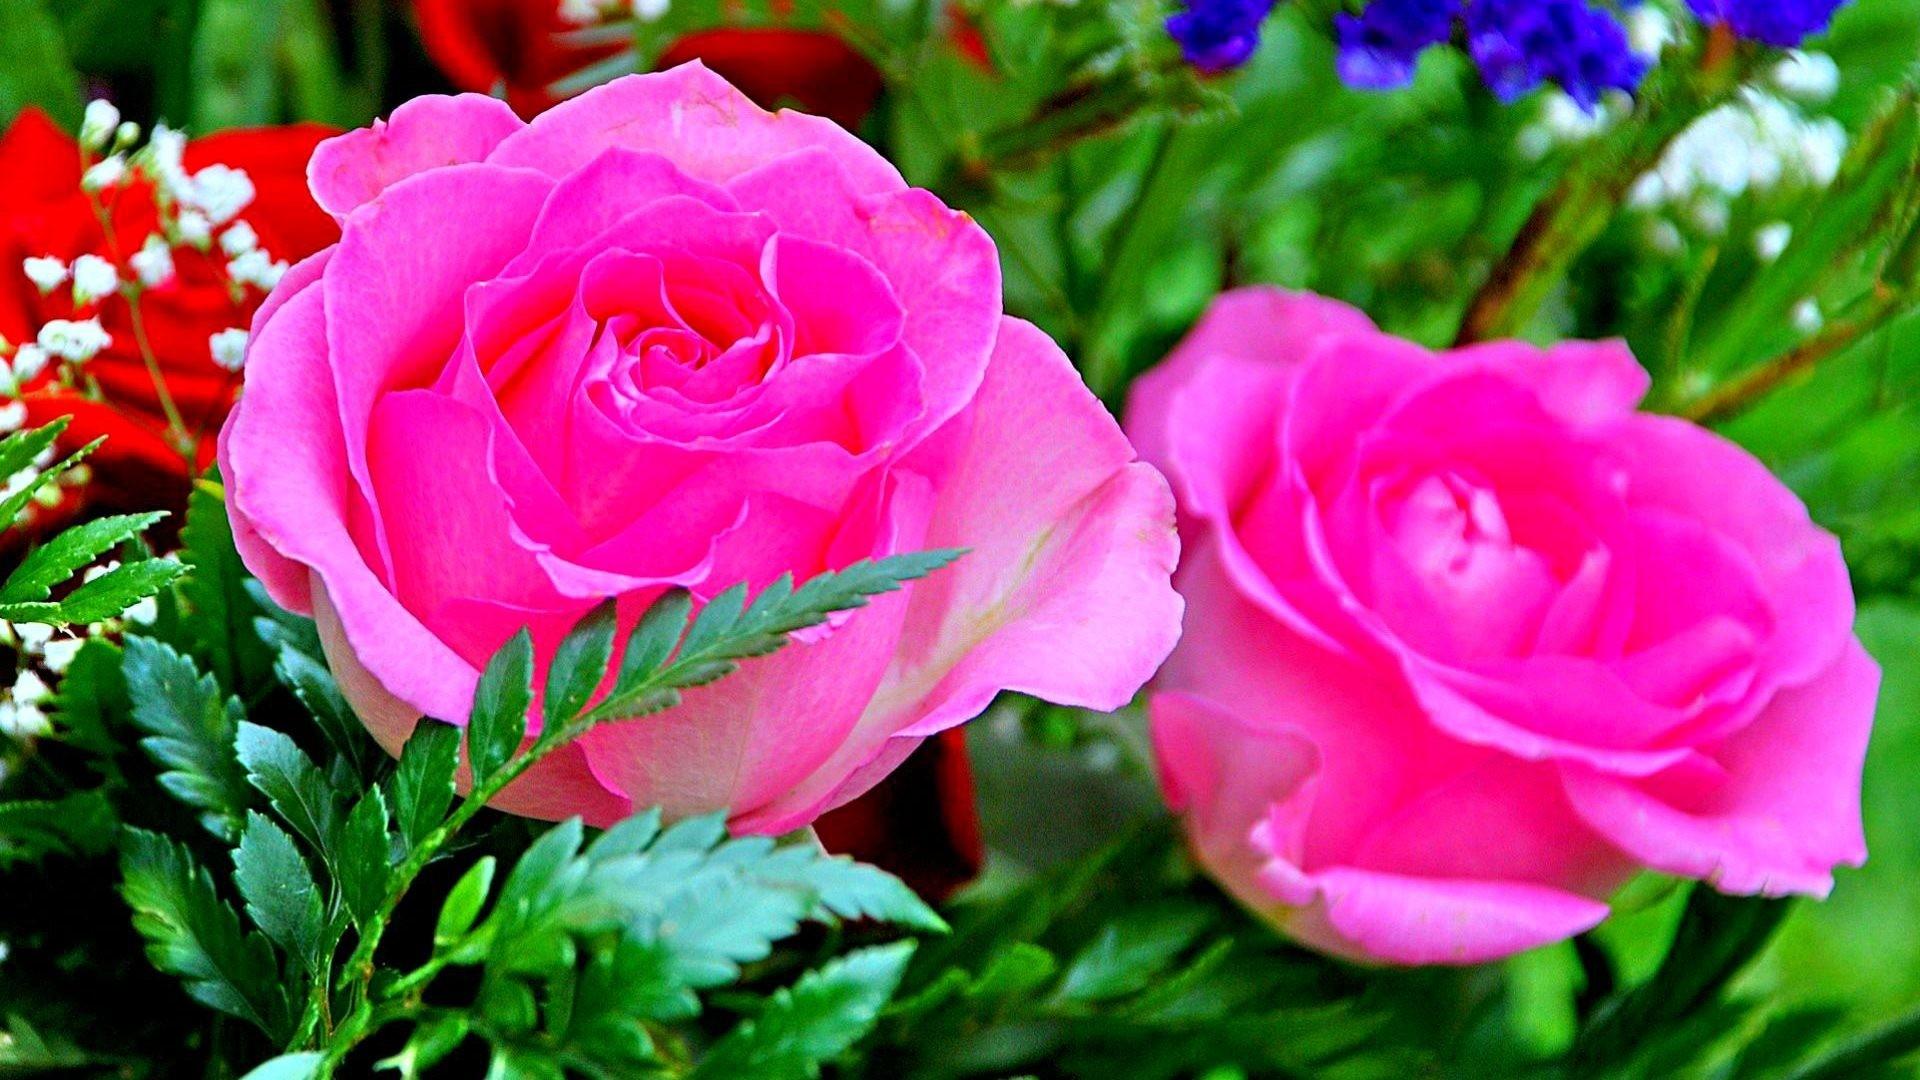 rose flower wallpaper hd free download,flower,flowering plant,petal,pink,plant